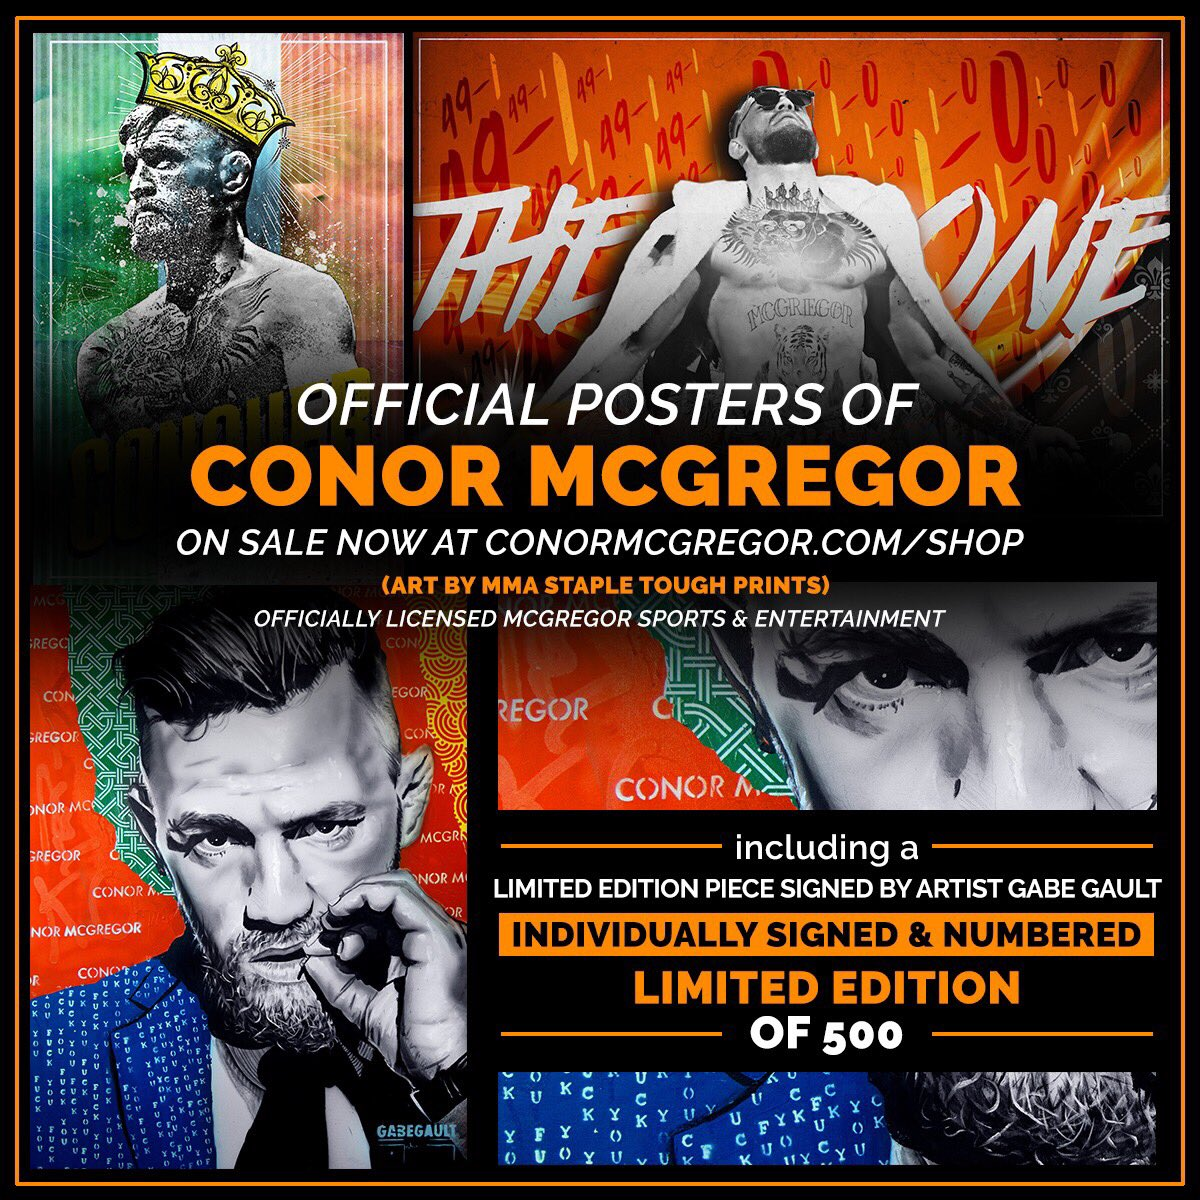 My official merchandise store. Come and get it! https://t.co/CDJYOk4Es8 https://t.co/VXXbu1vxTO